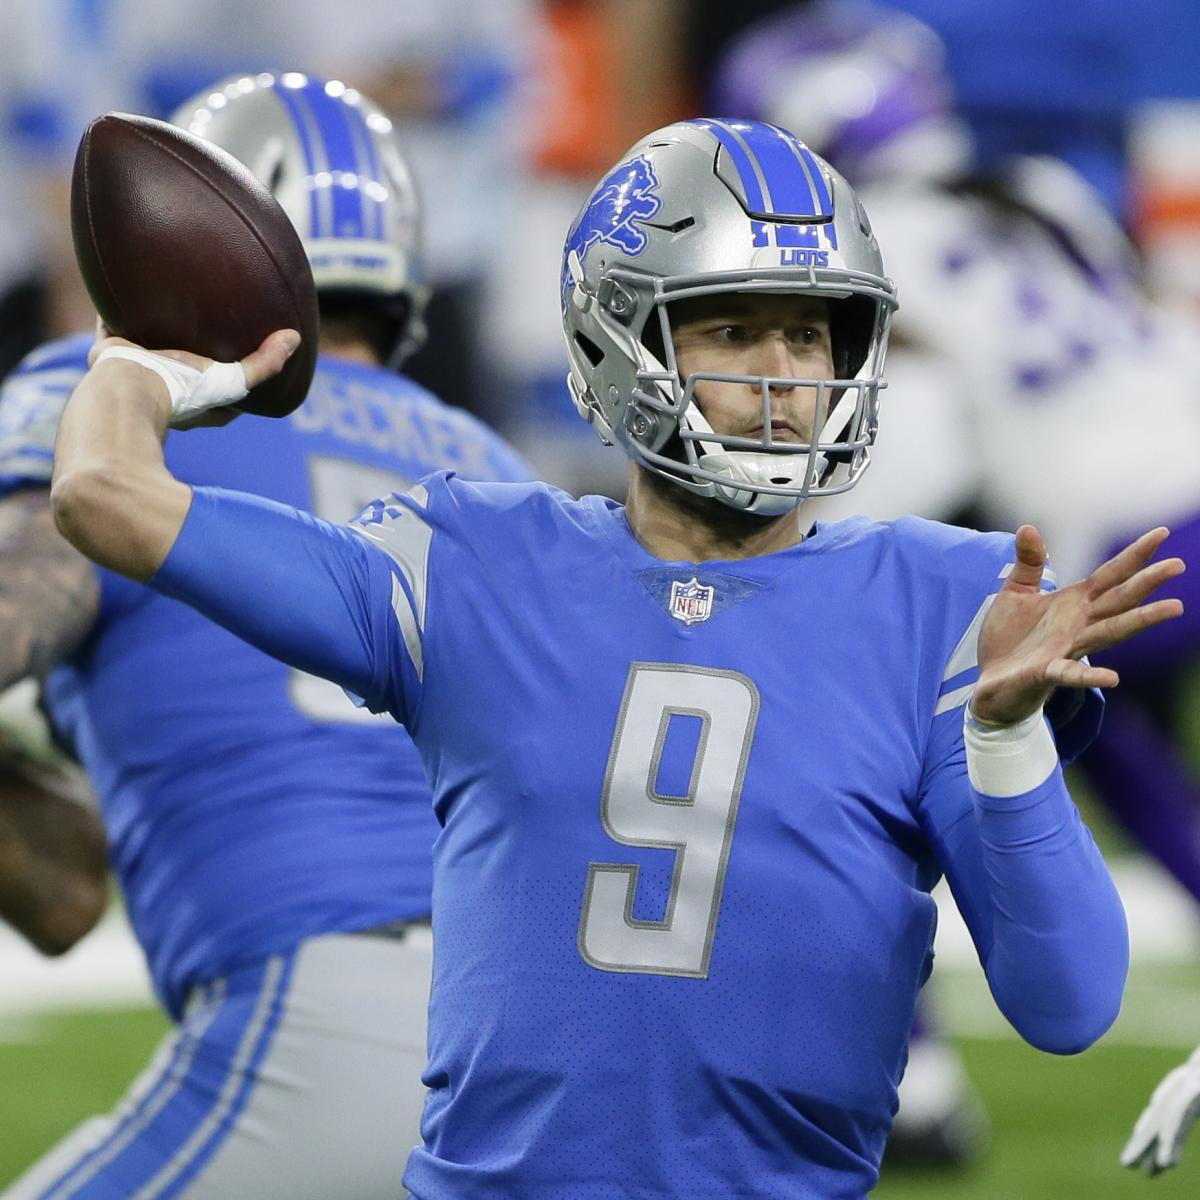 Super Bowl 56 Odds: Rams Climb Betting Favorites List After Stafford-Goff Trade